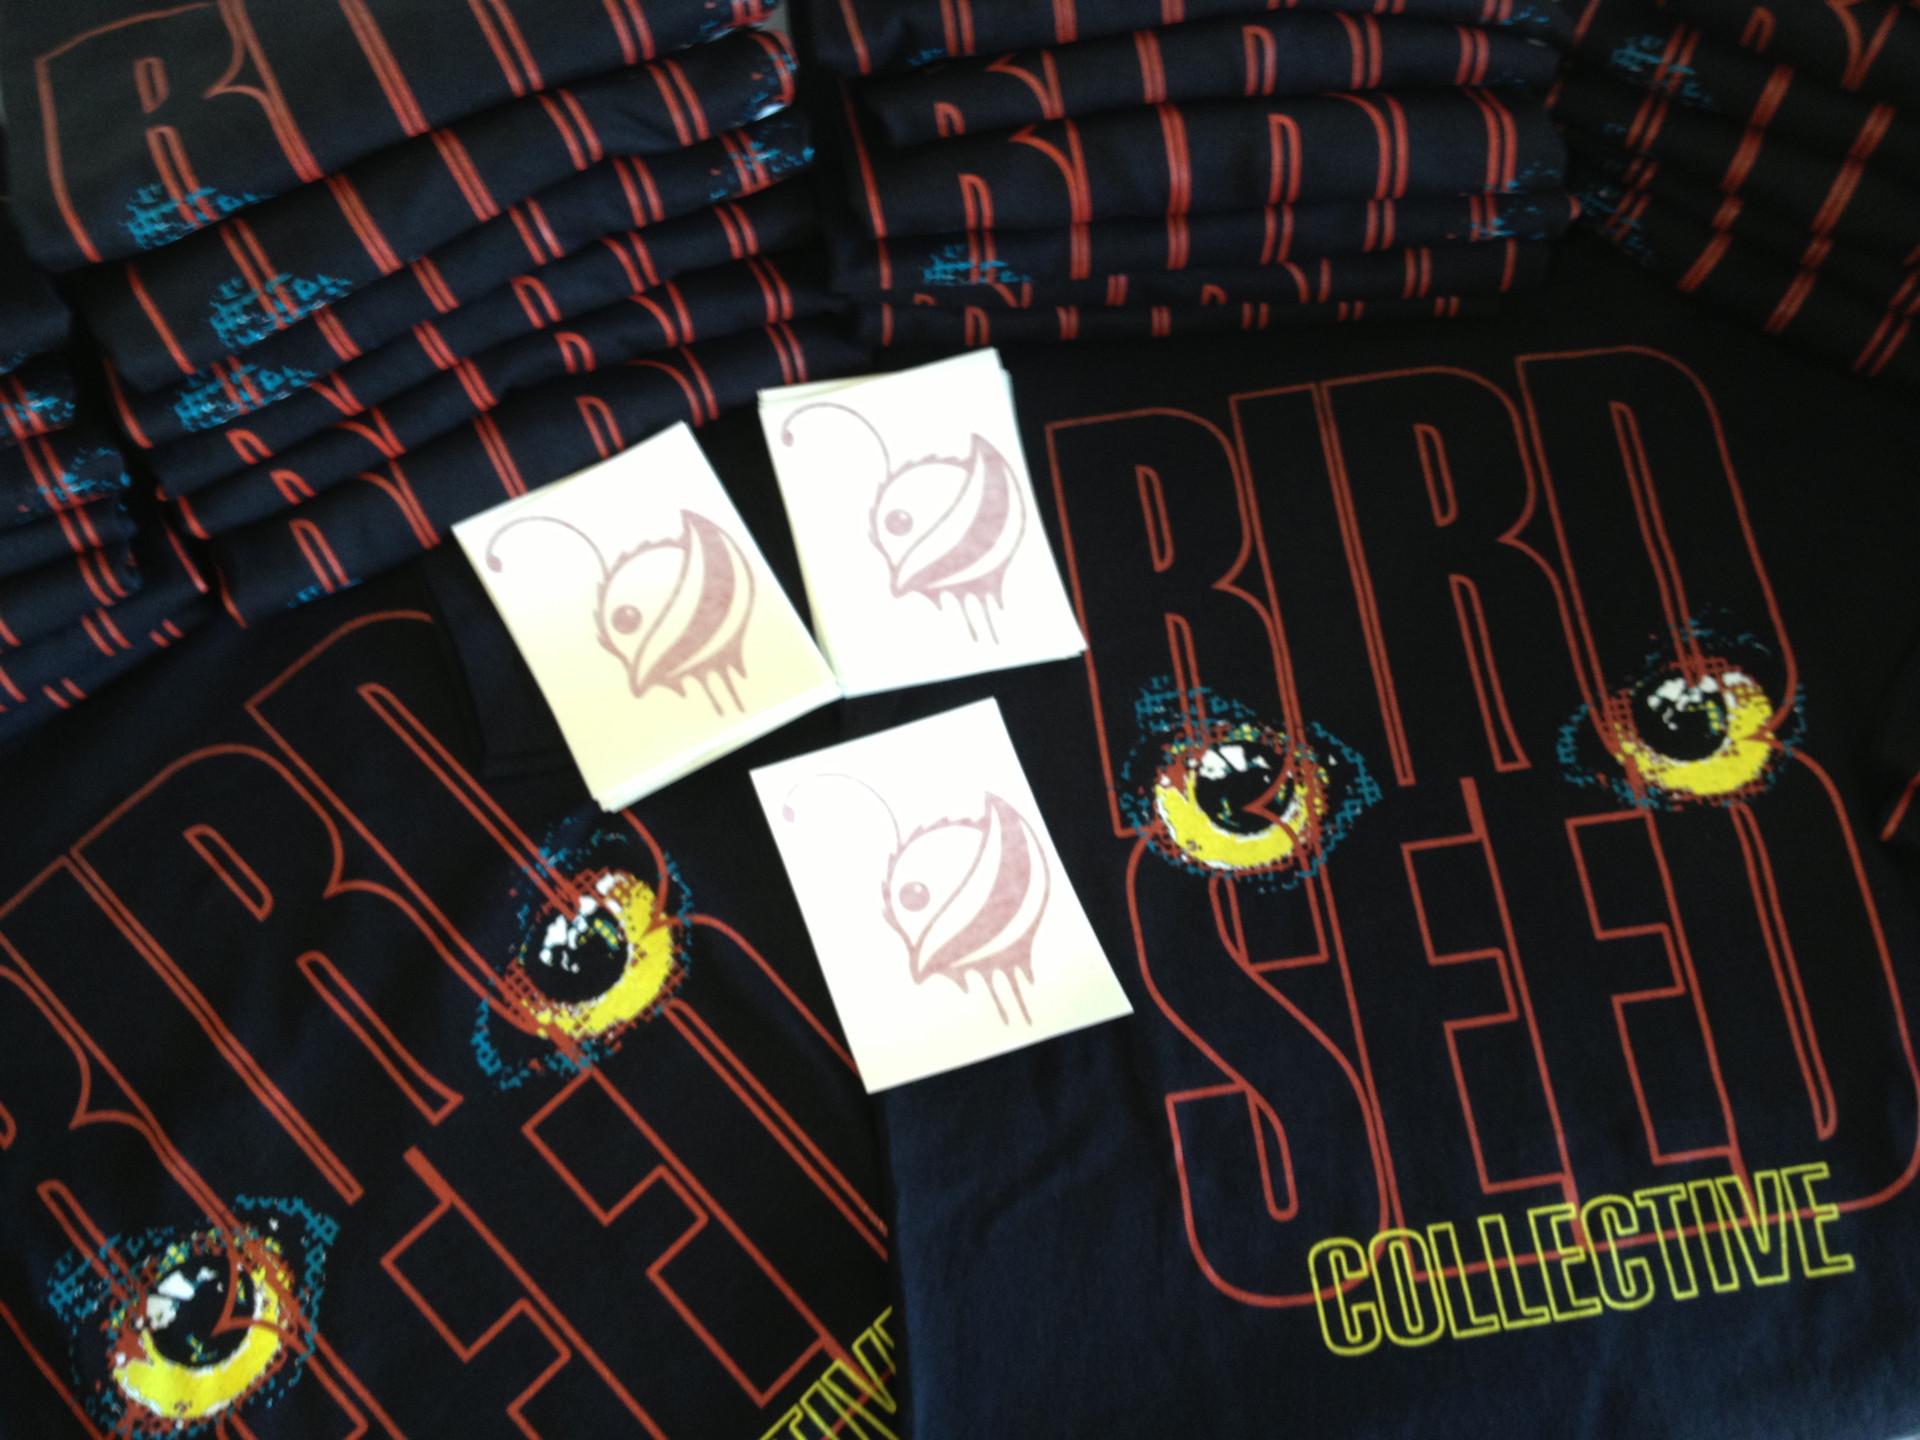 BirdseedOwlEyesShirts.JPG